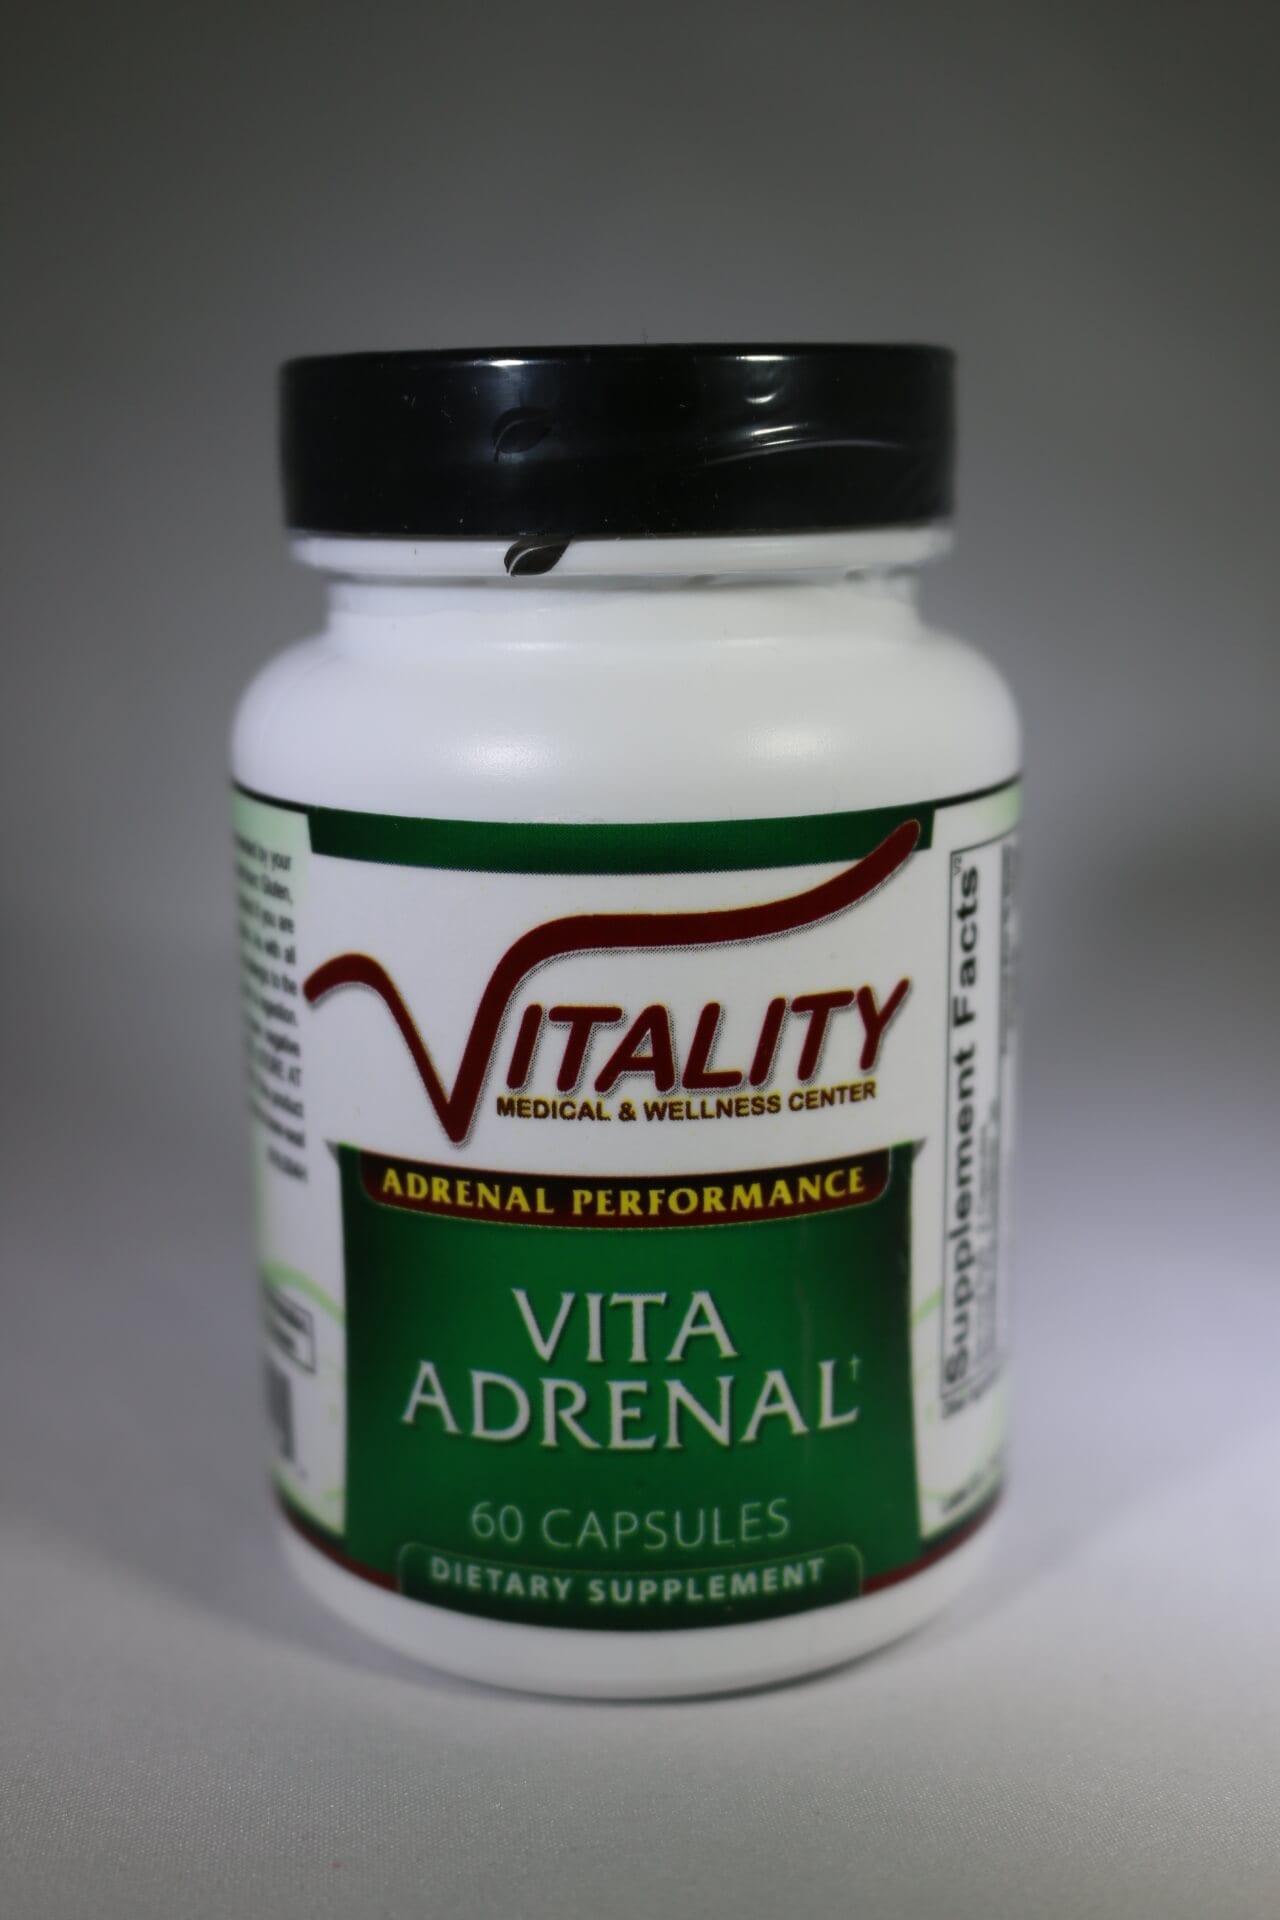 vitality vita adrenal